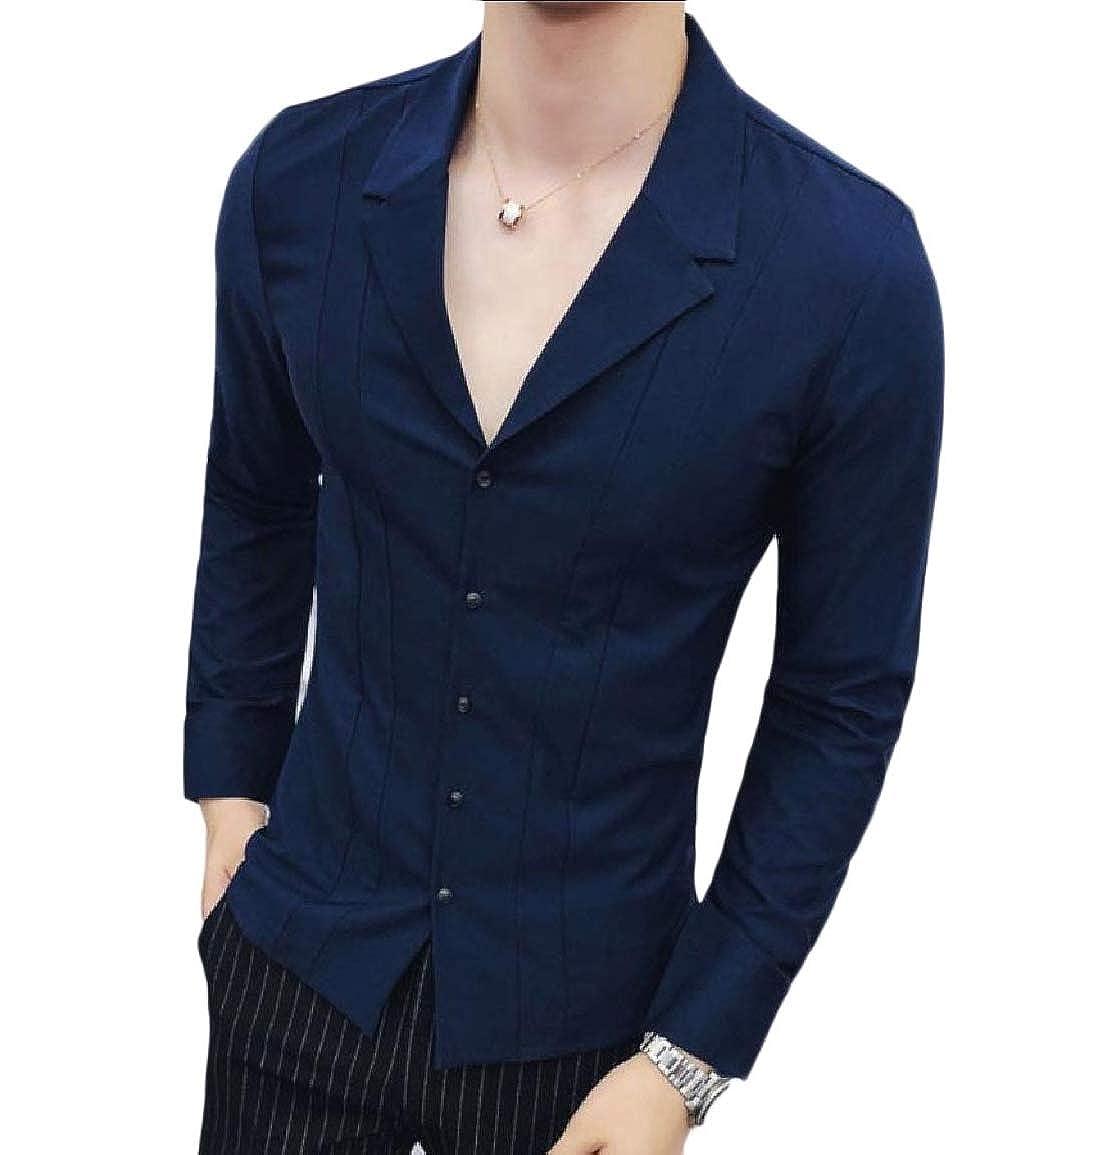 Vska Men Vogue Long Sleeve Solid Slim Fit Autumn Notch Lapel Shirt